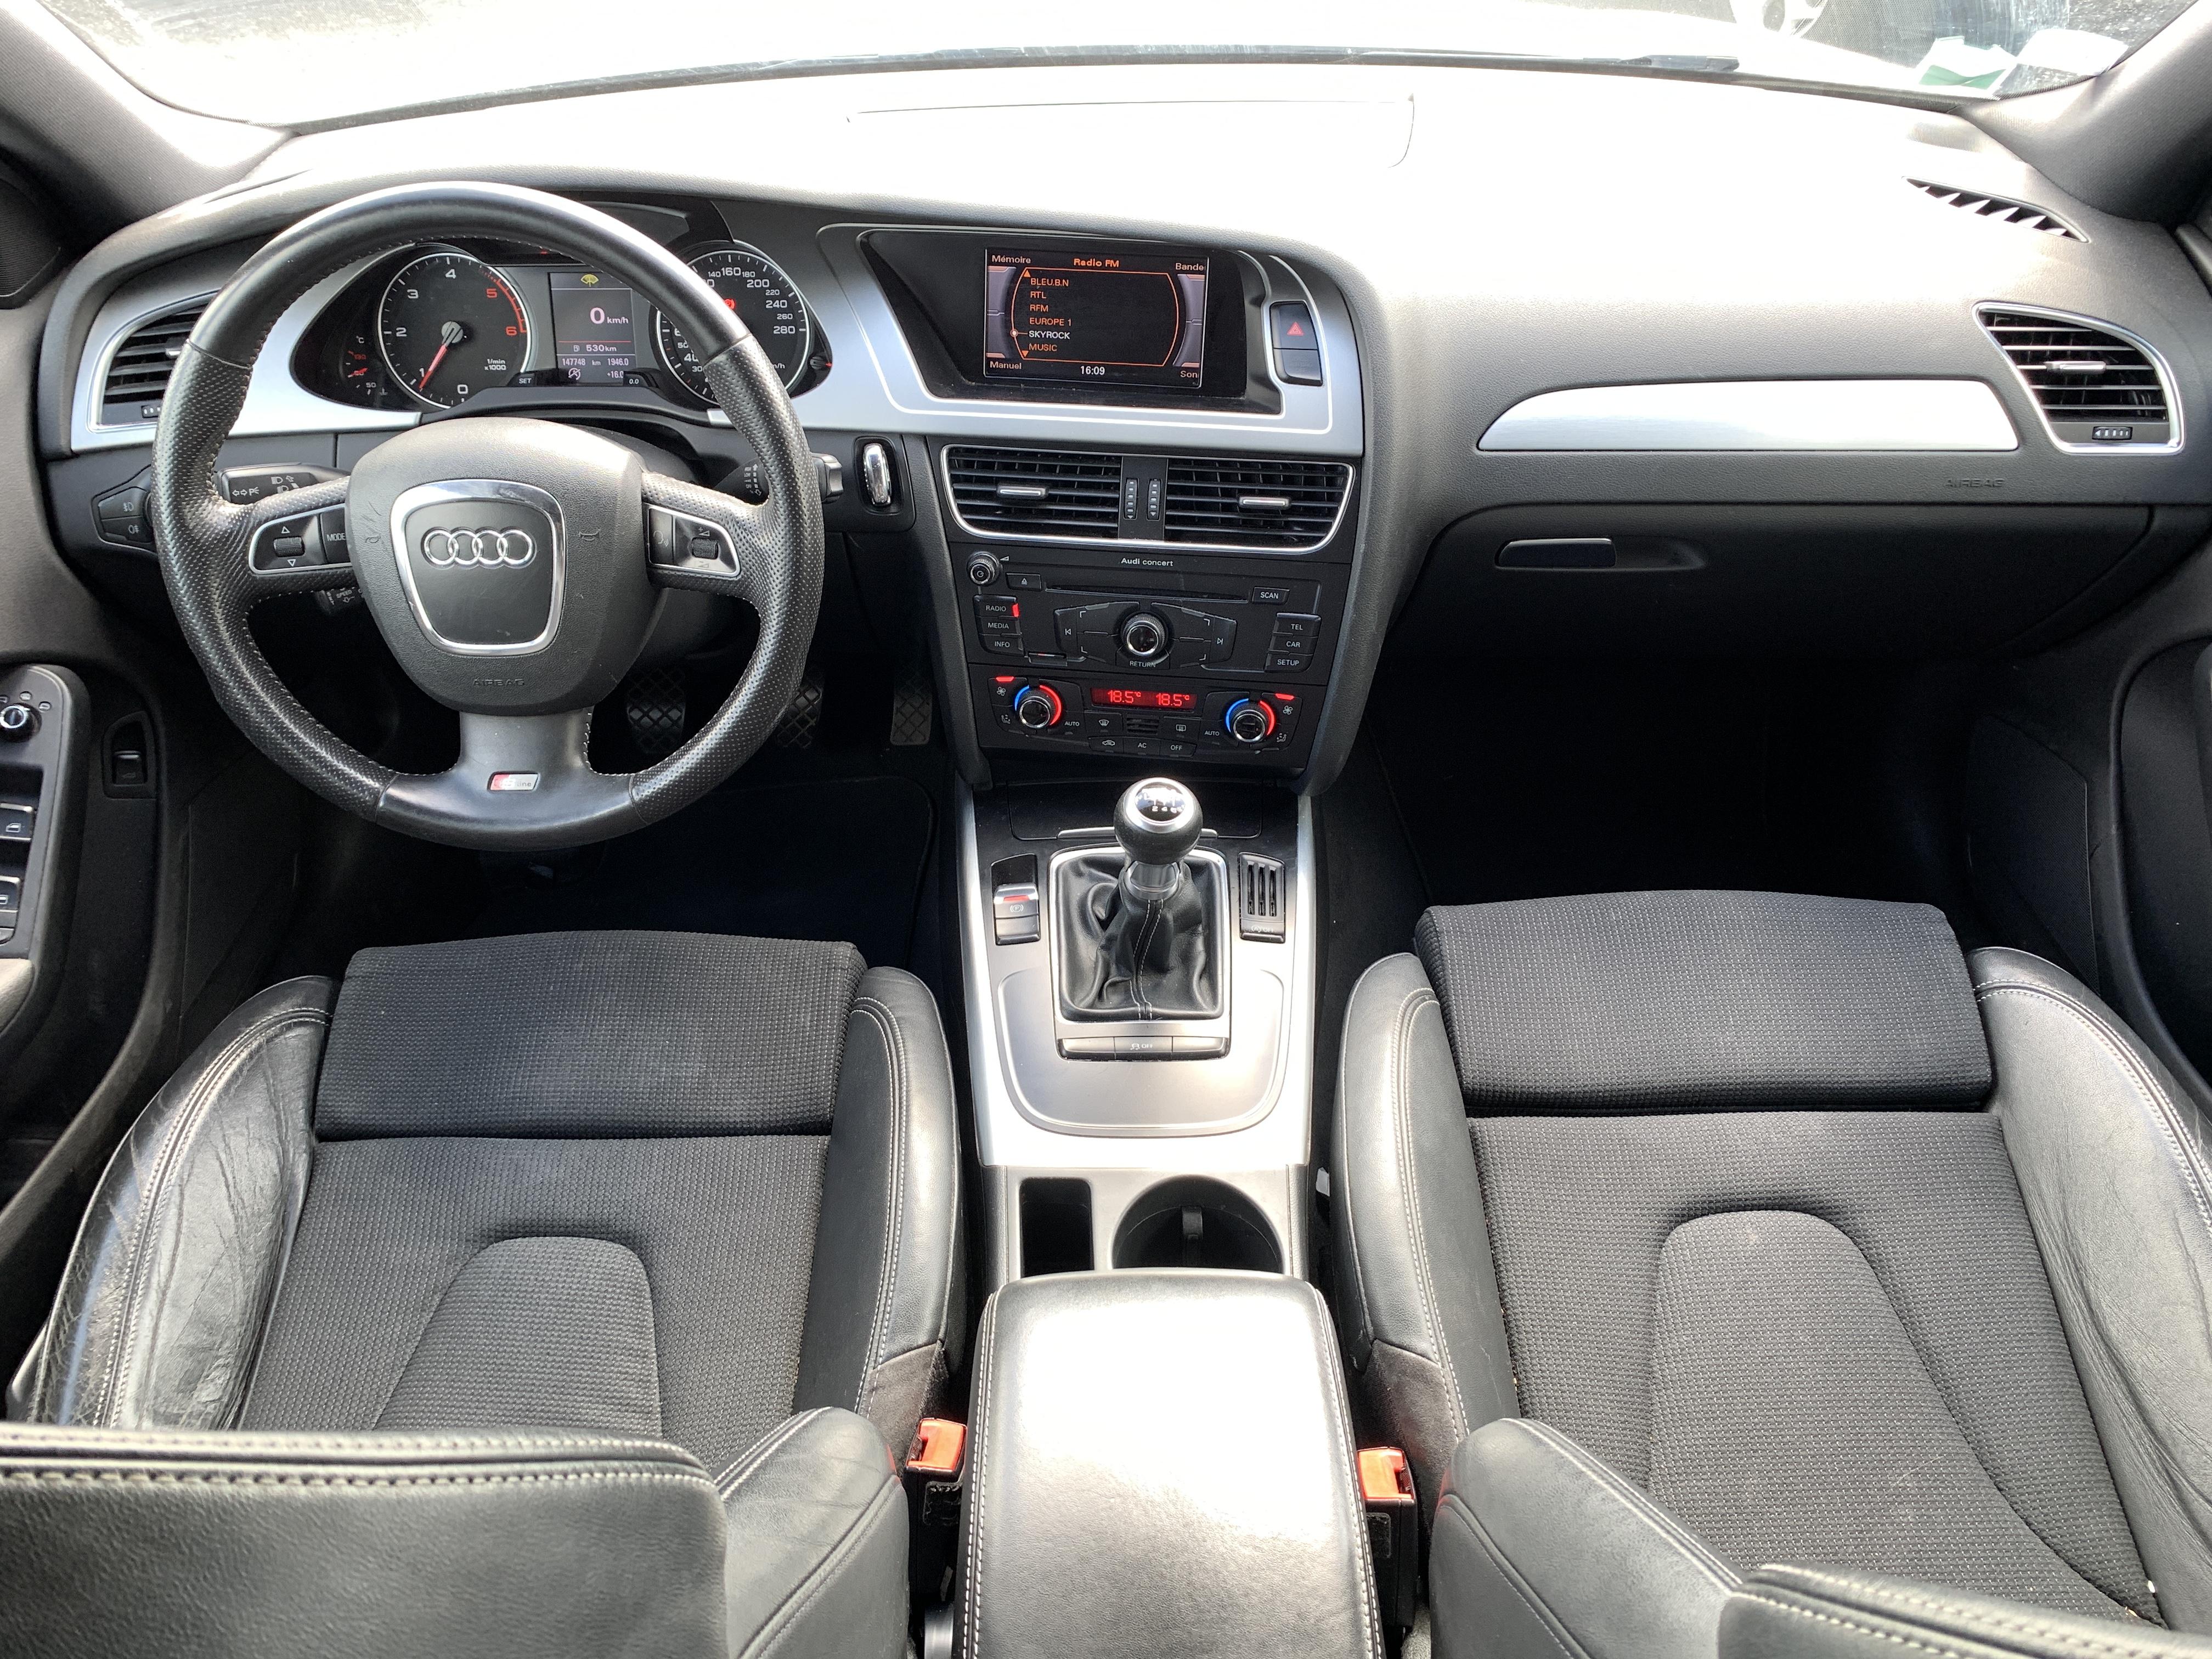 photo_Audi A4 2.0 TDi 120 CH S-LINE, Carslift